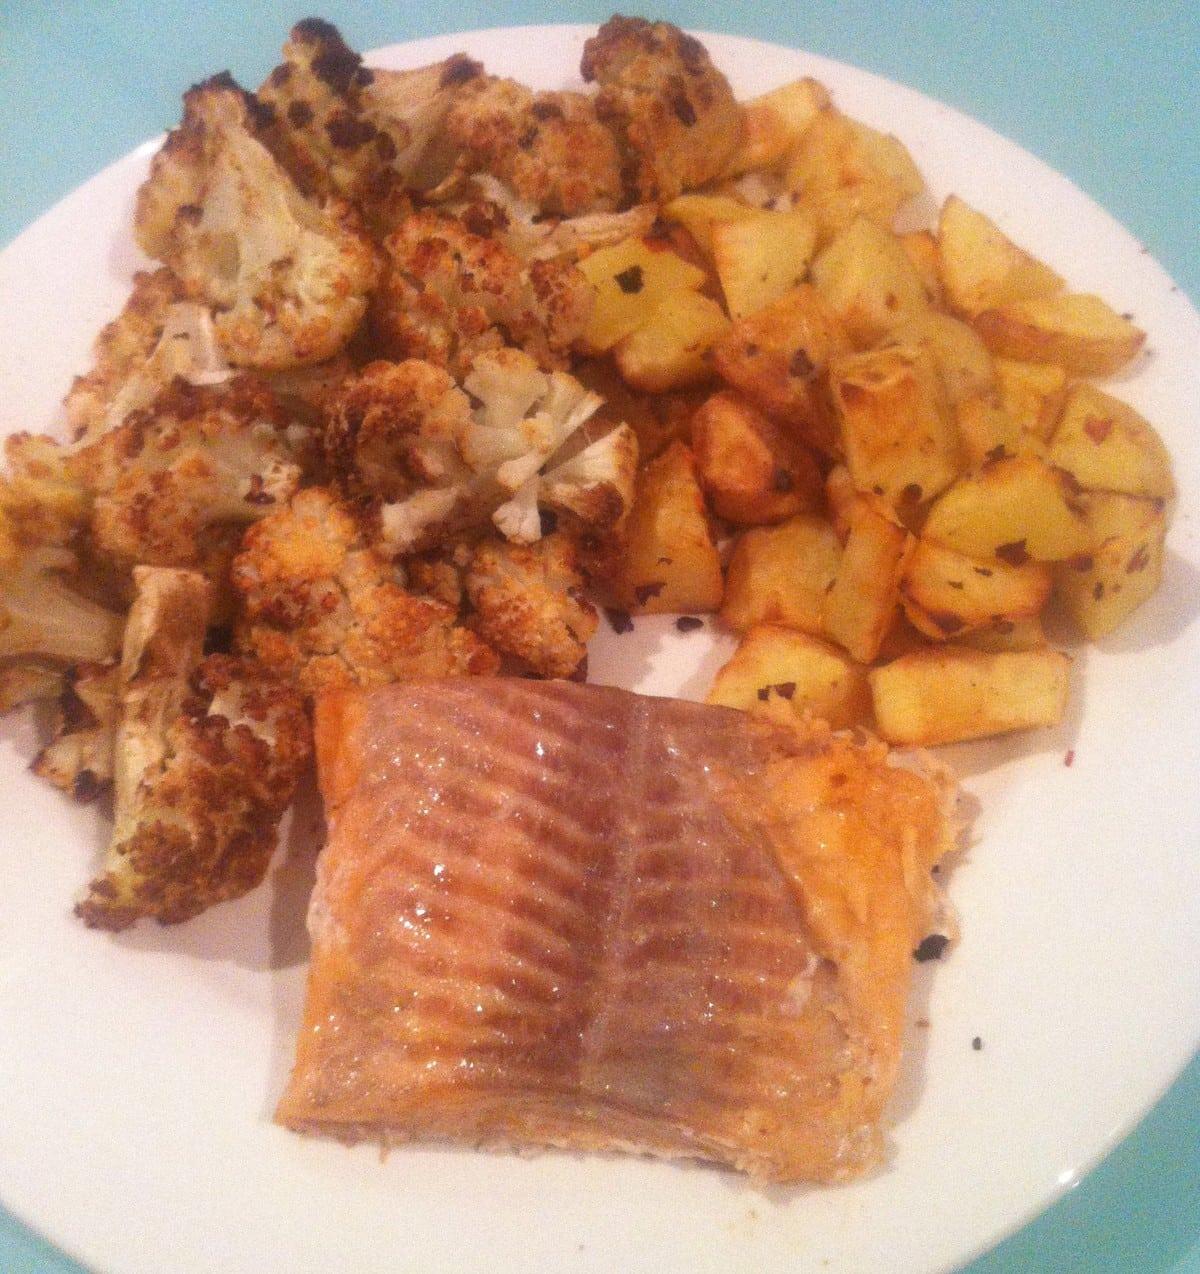 Is It Ok To Eat Burnt Food